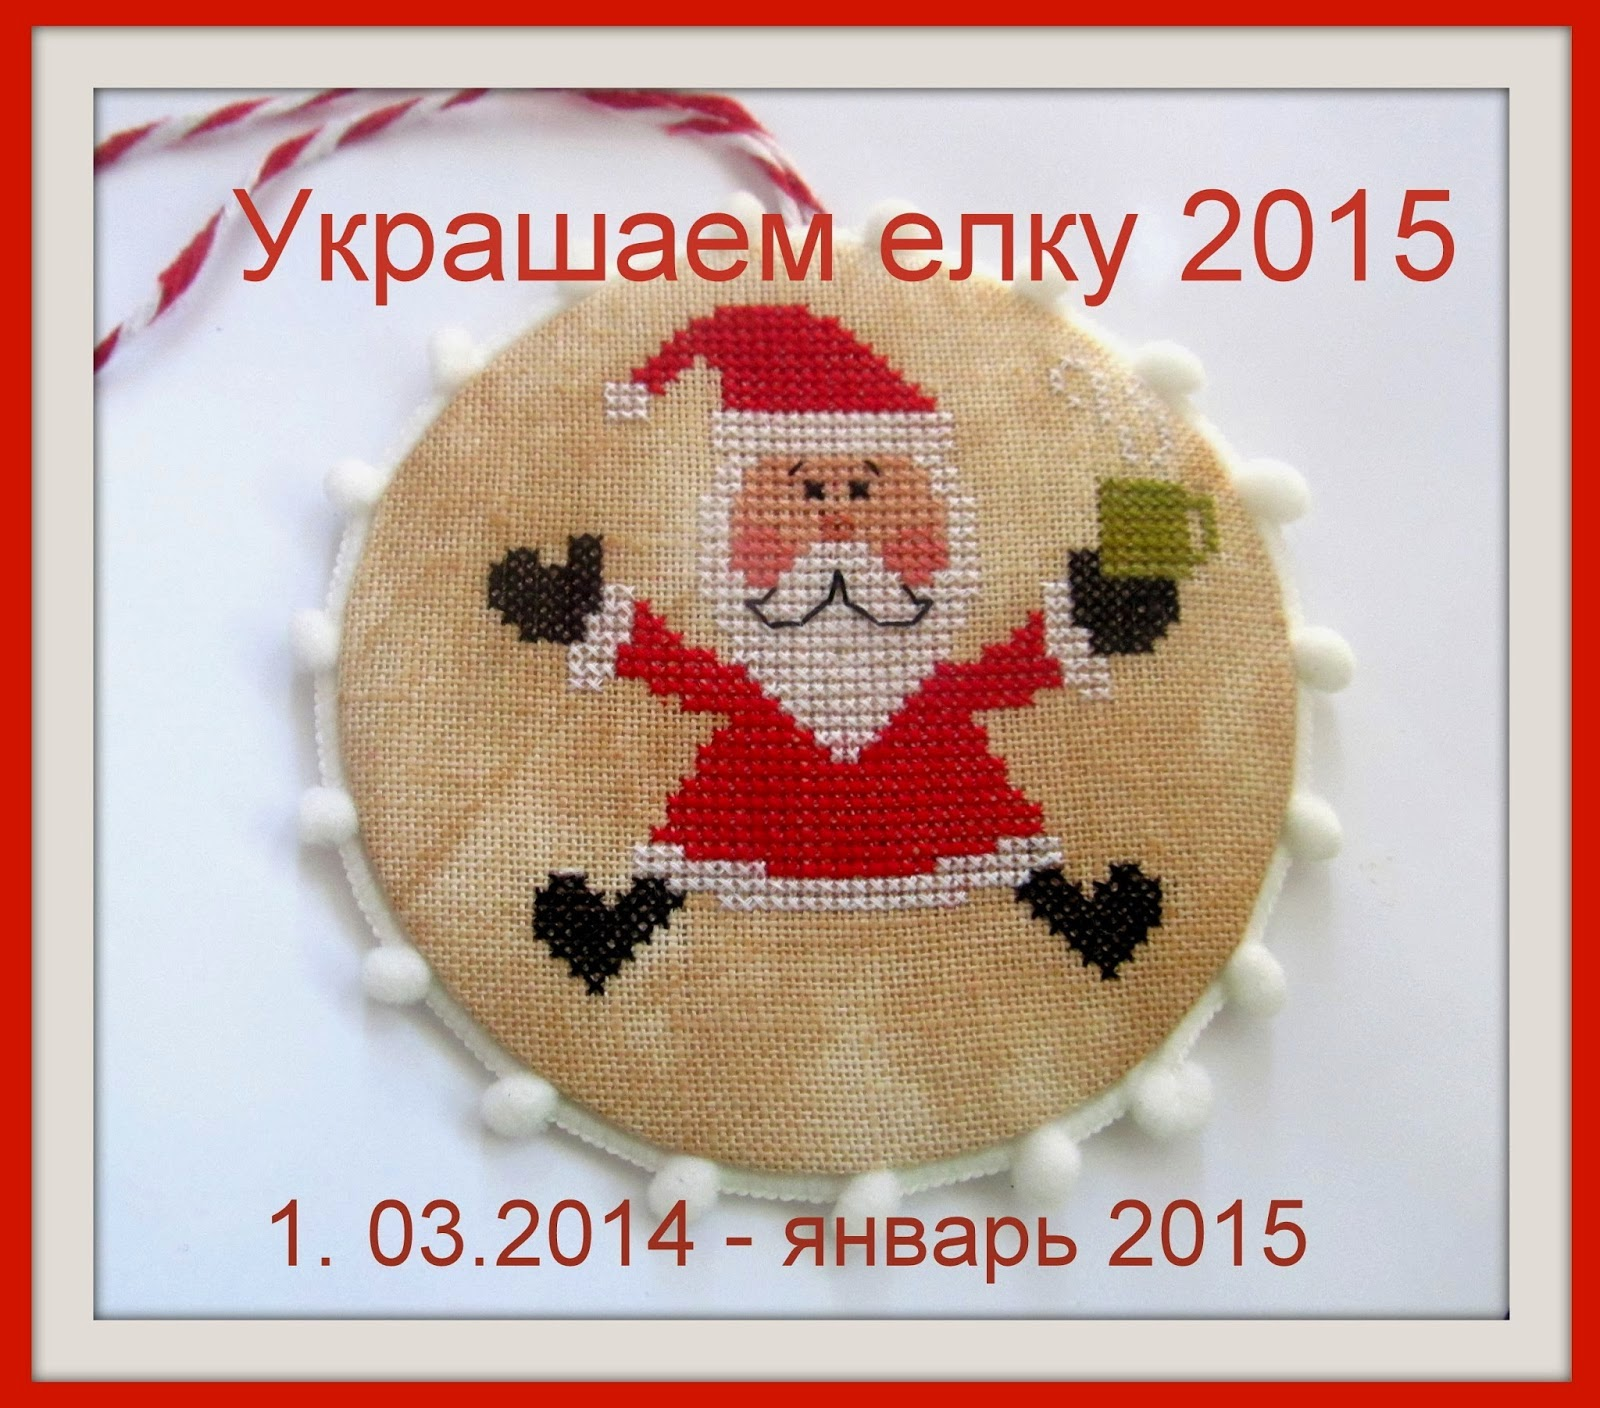 http://nikulj.blogspot.com/2014/10/sal-2015_31.html